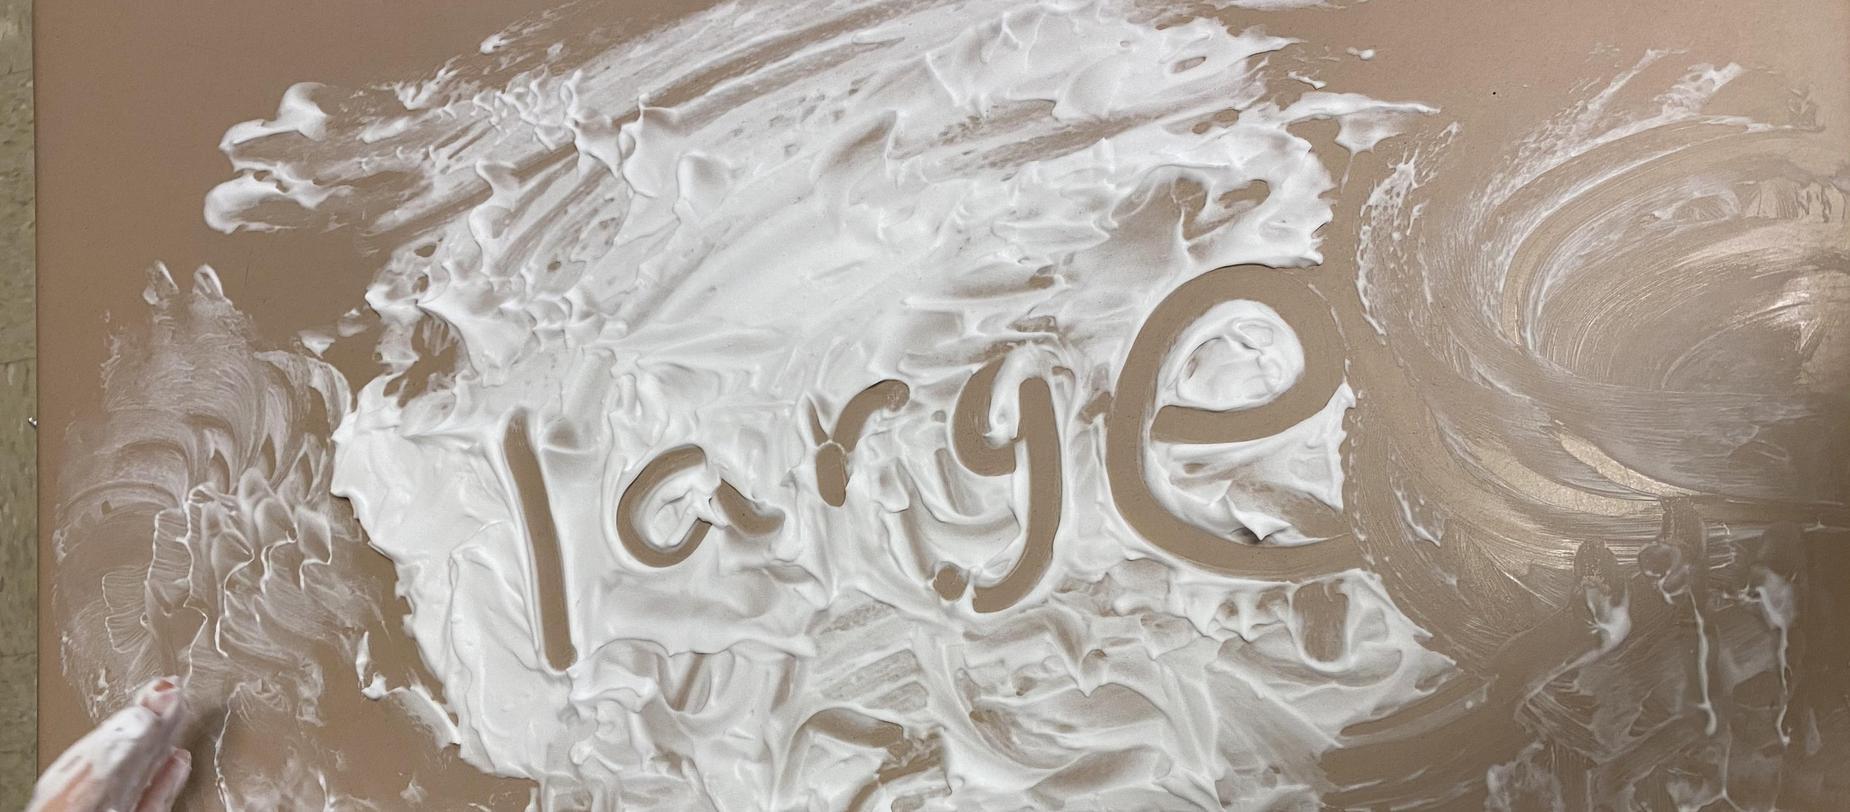 the word 'large' written in shaving cream